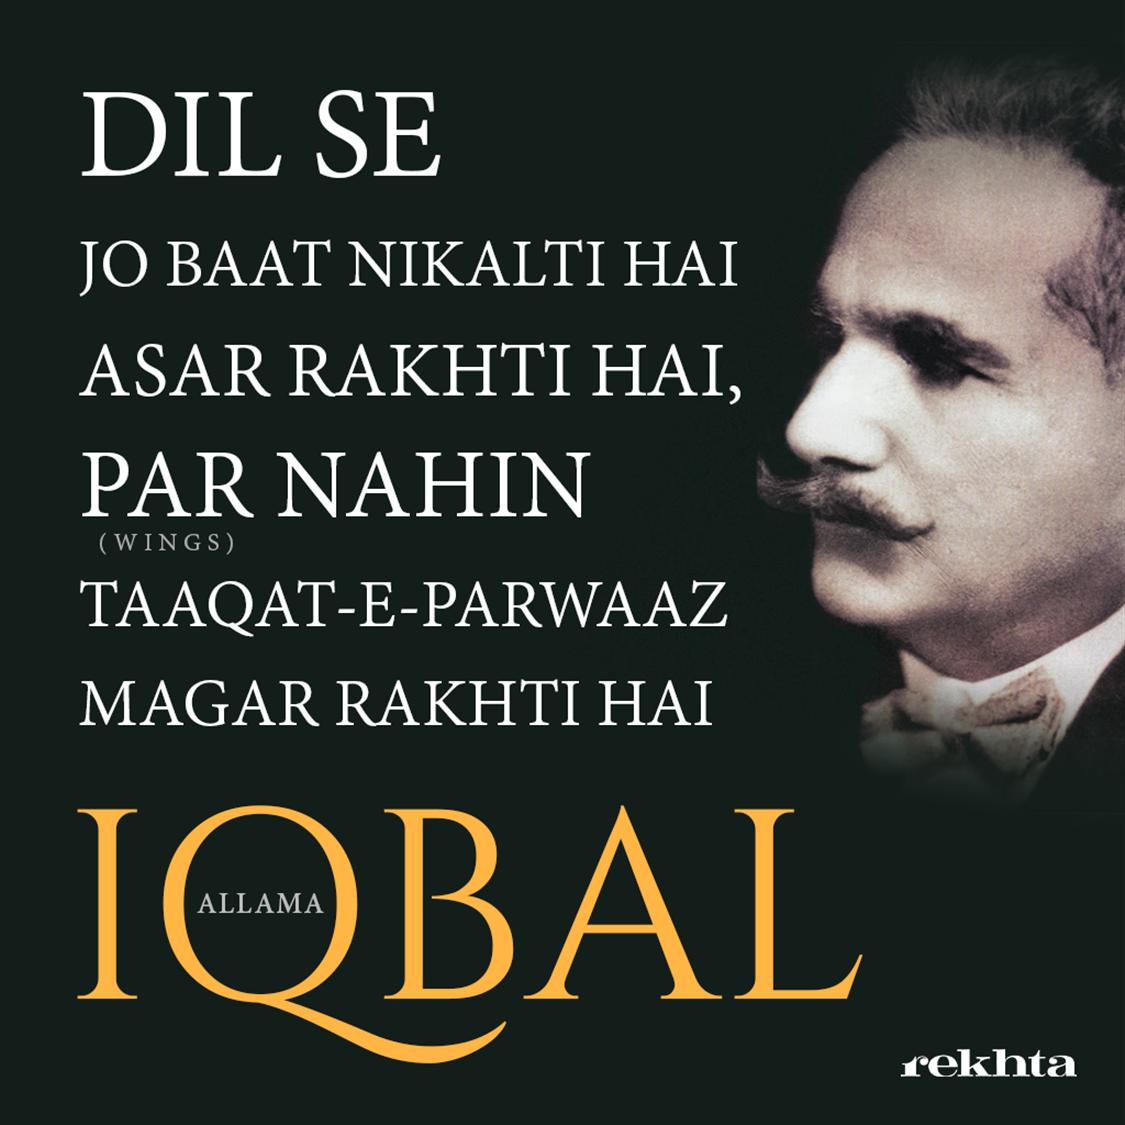 dil se jo baat nikaltii hai asar rakhtii hai-Allama Iqbal